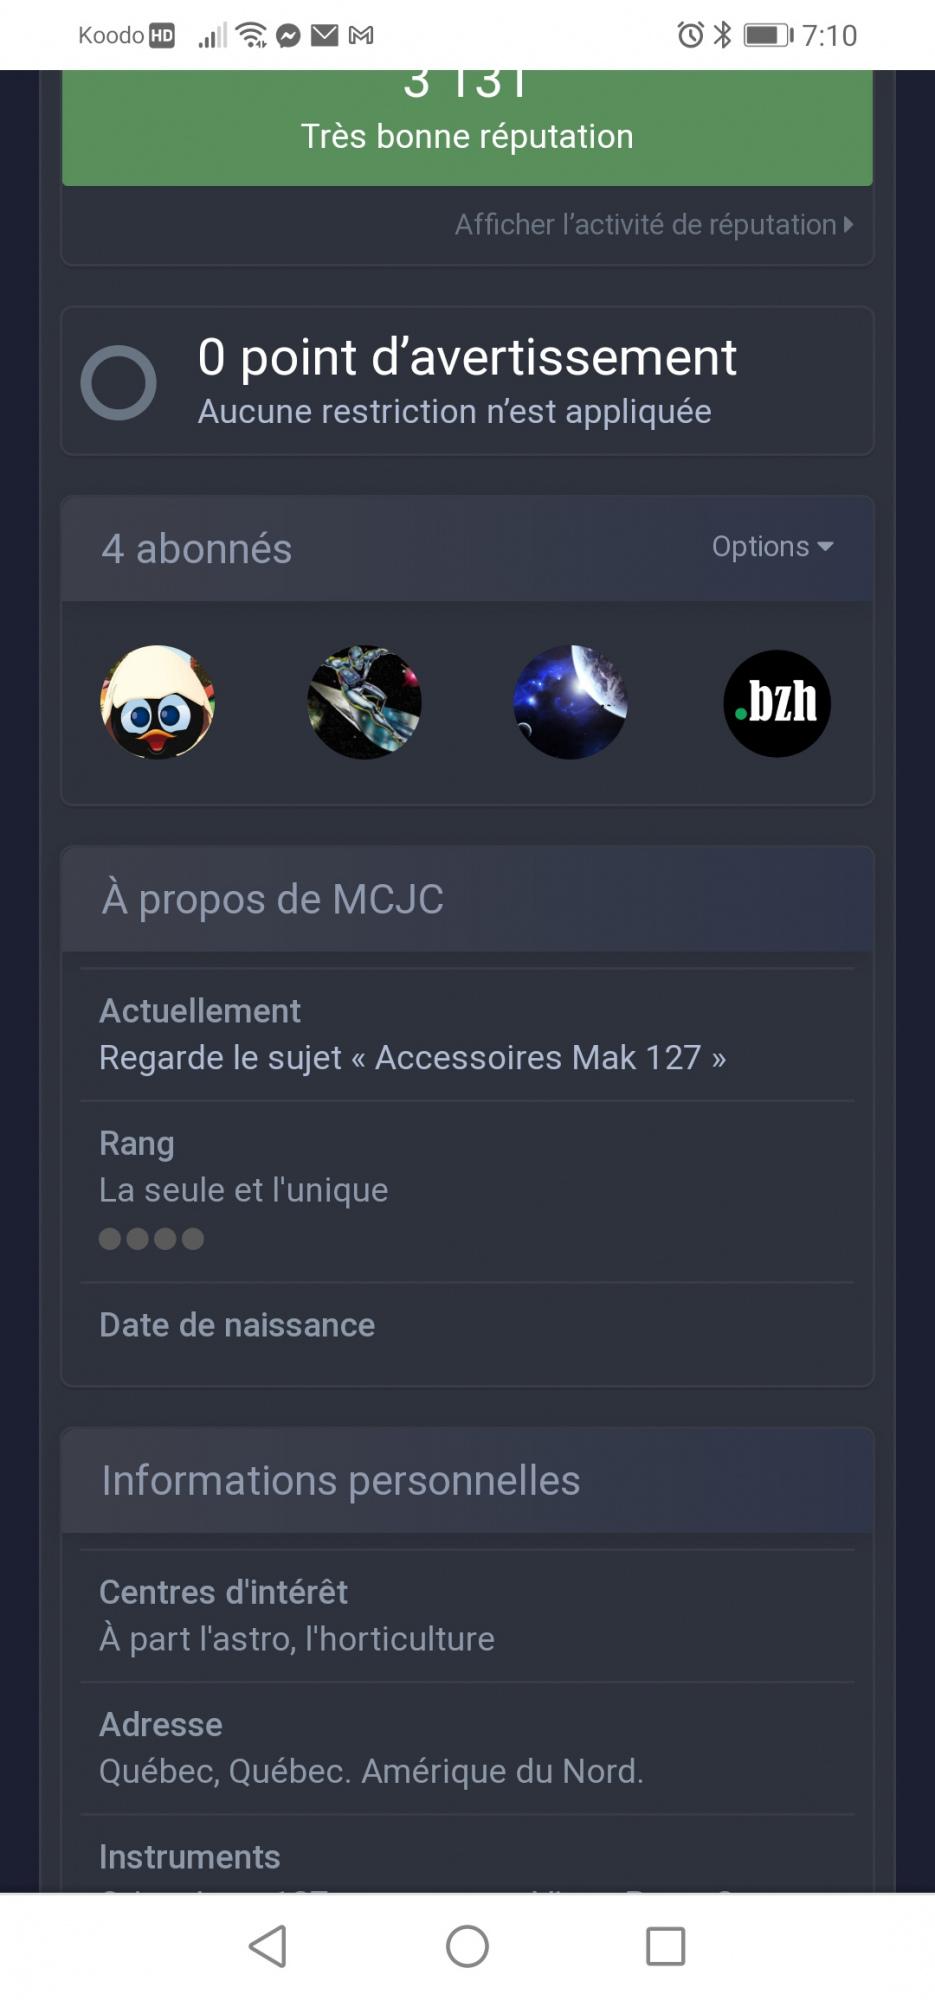 Screenshot_20210105_071057_com.android.chrome.thumb.jpg.b5a6820ea143f3f4eb161ccafa8bd54d.jpg